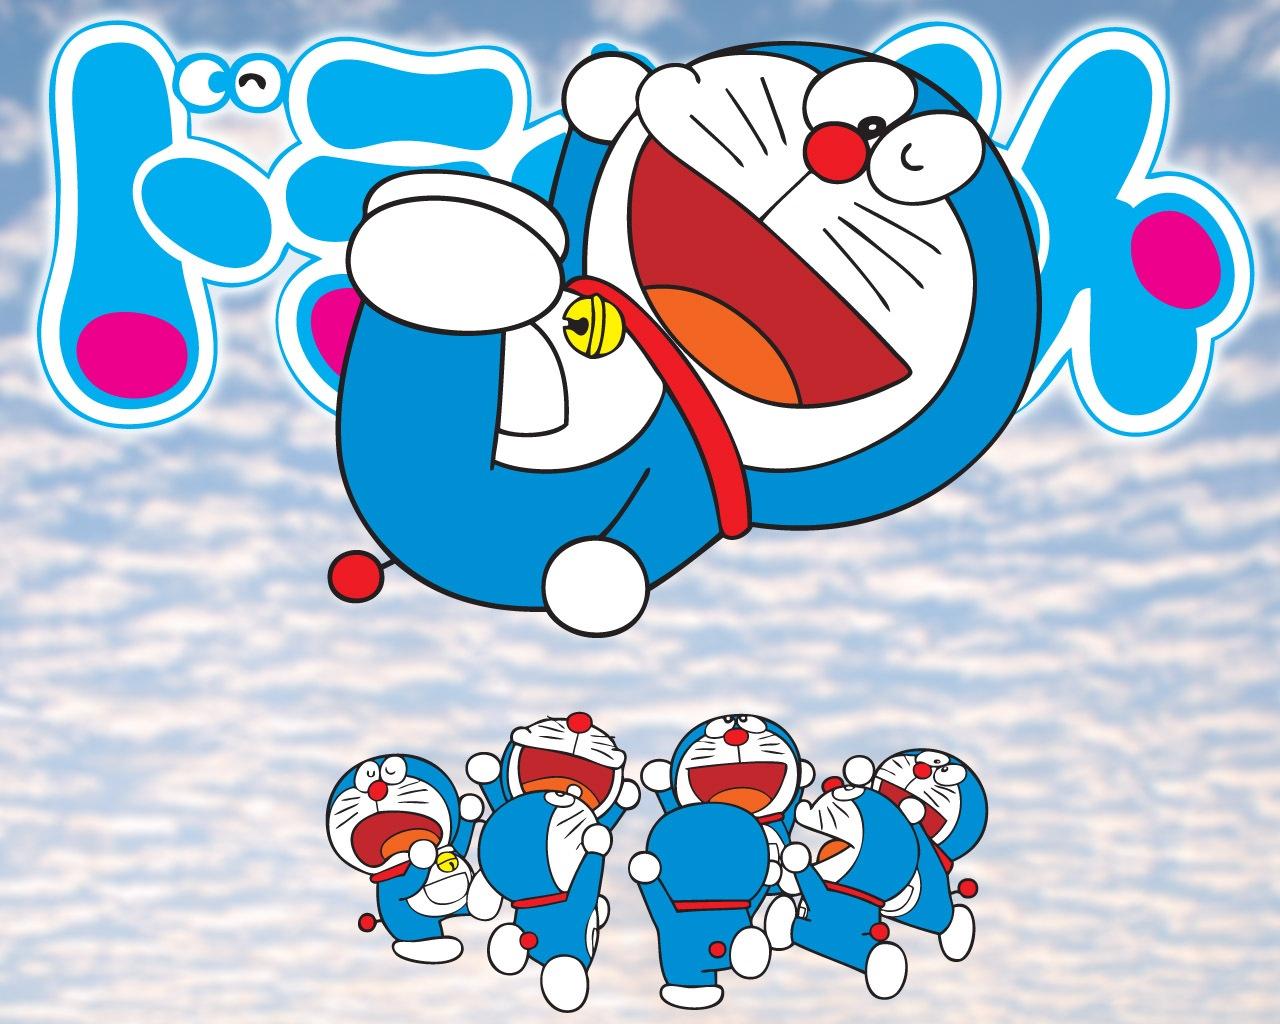 Free Download Wallpaper Collection Doraemon Wallpaper 1280x1024